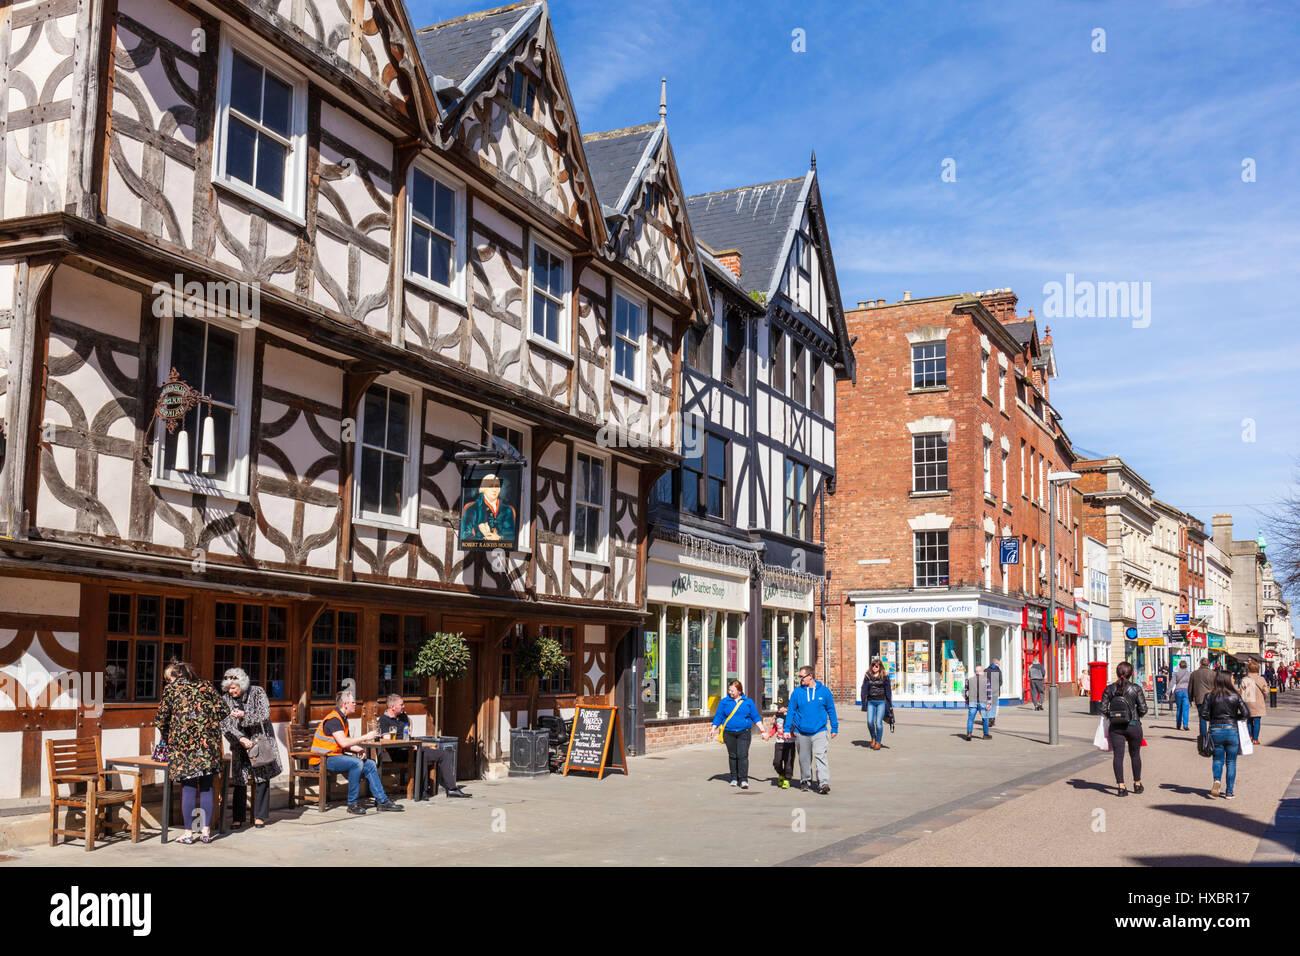 Del centro de la ciudad de Gloucester gloucestershire uk pub exterior High street uk Imagen De Stock